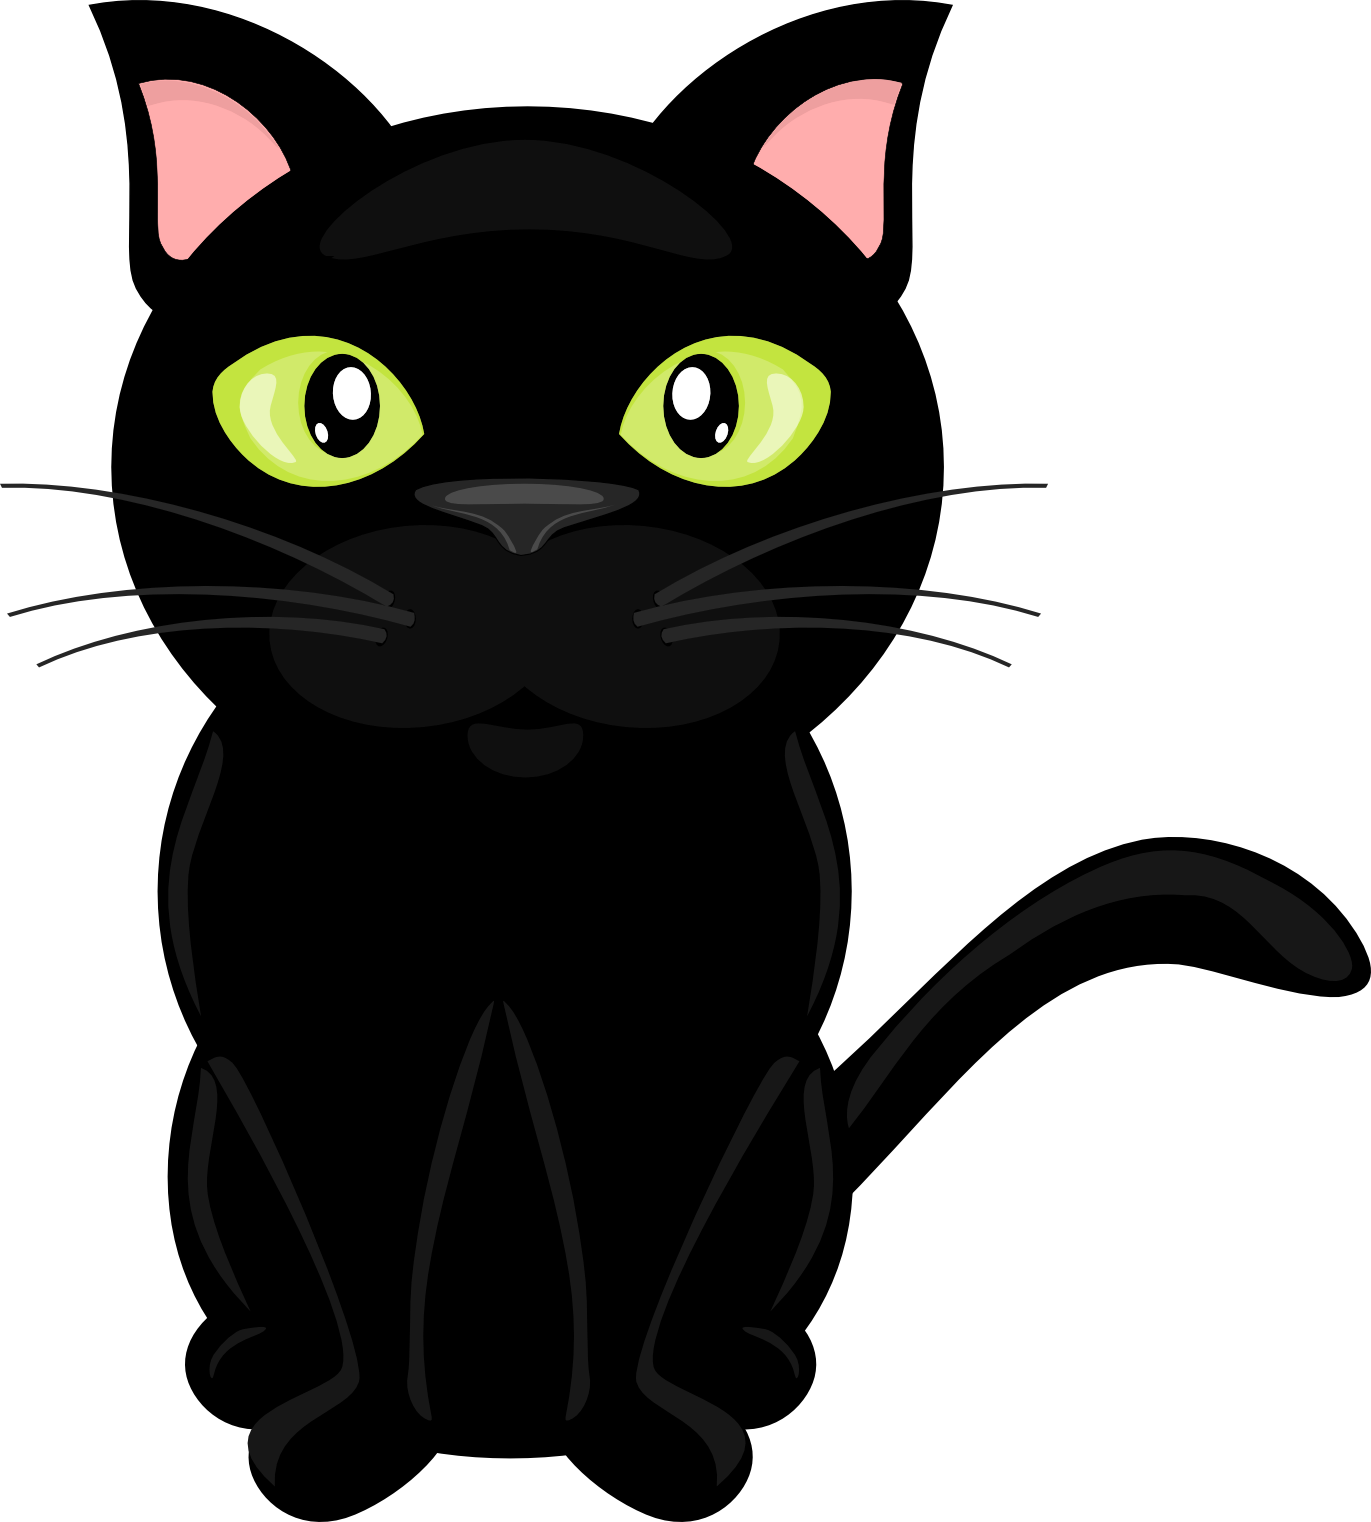 On The Farm Clip Art Cute Black Cats Cat Clipart Cat Silhouette